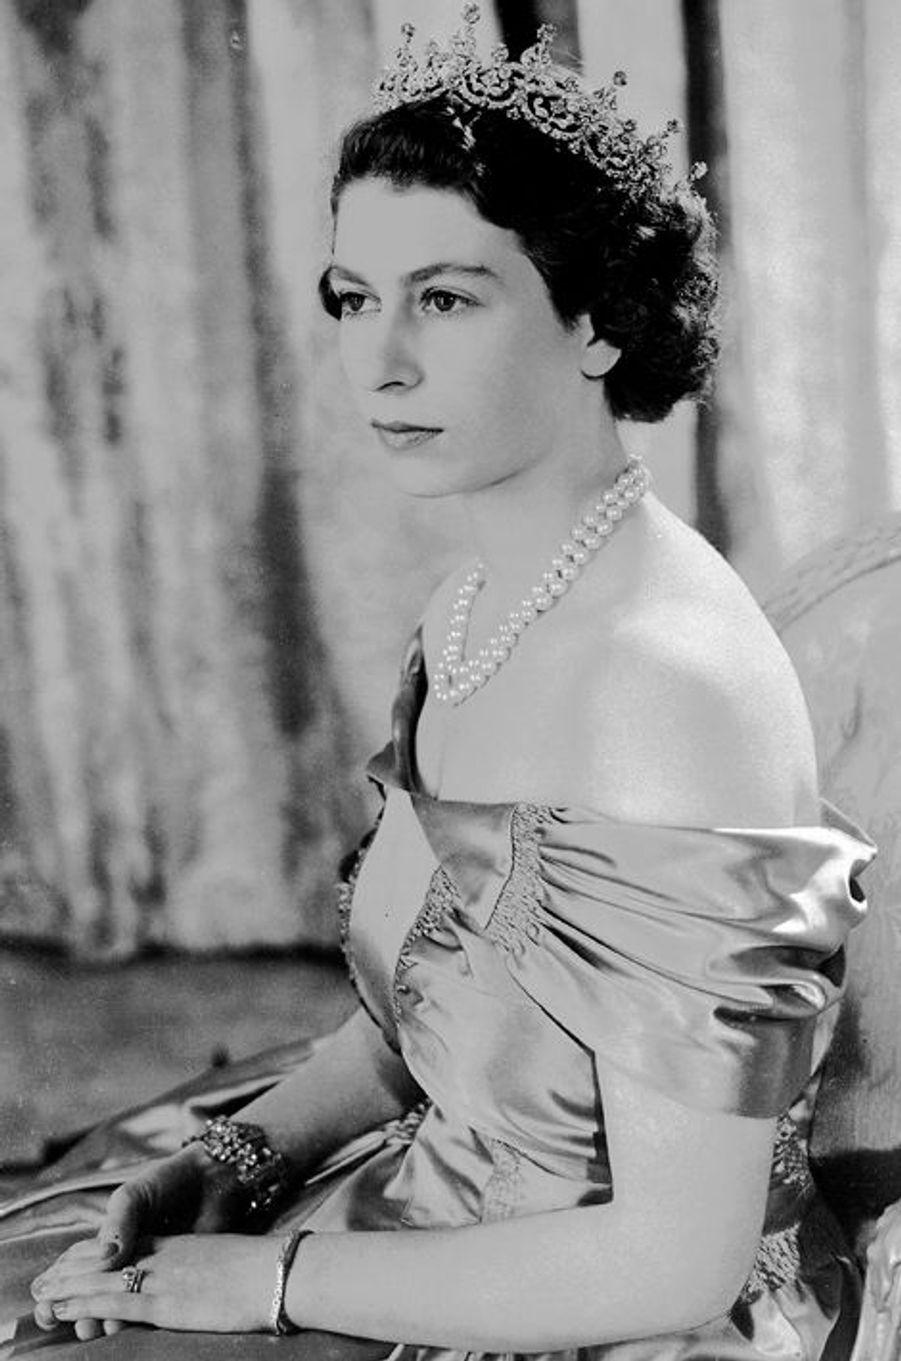 La princesse Elizabeth, le 30 août 1949